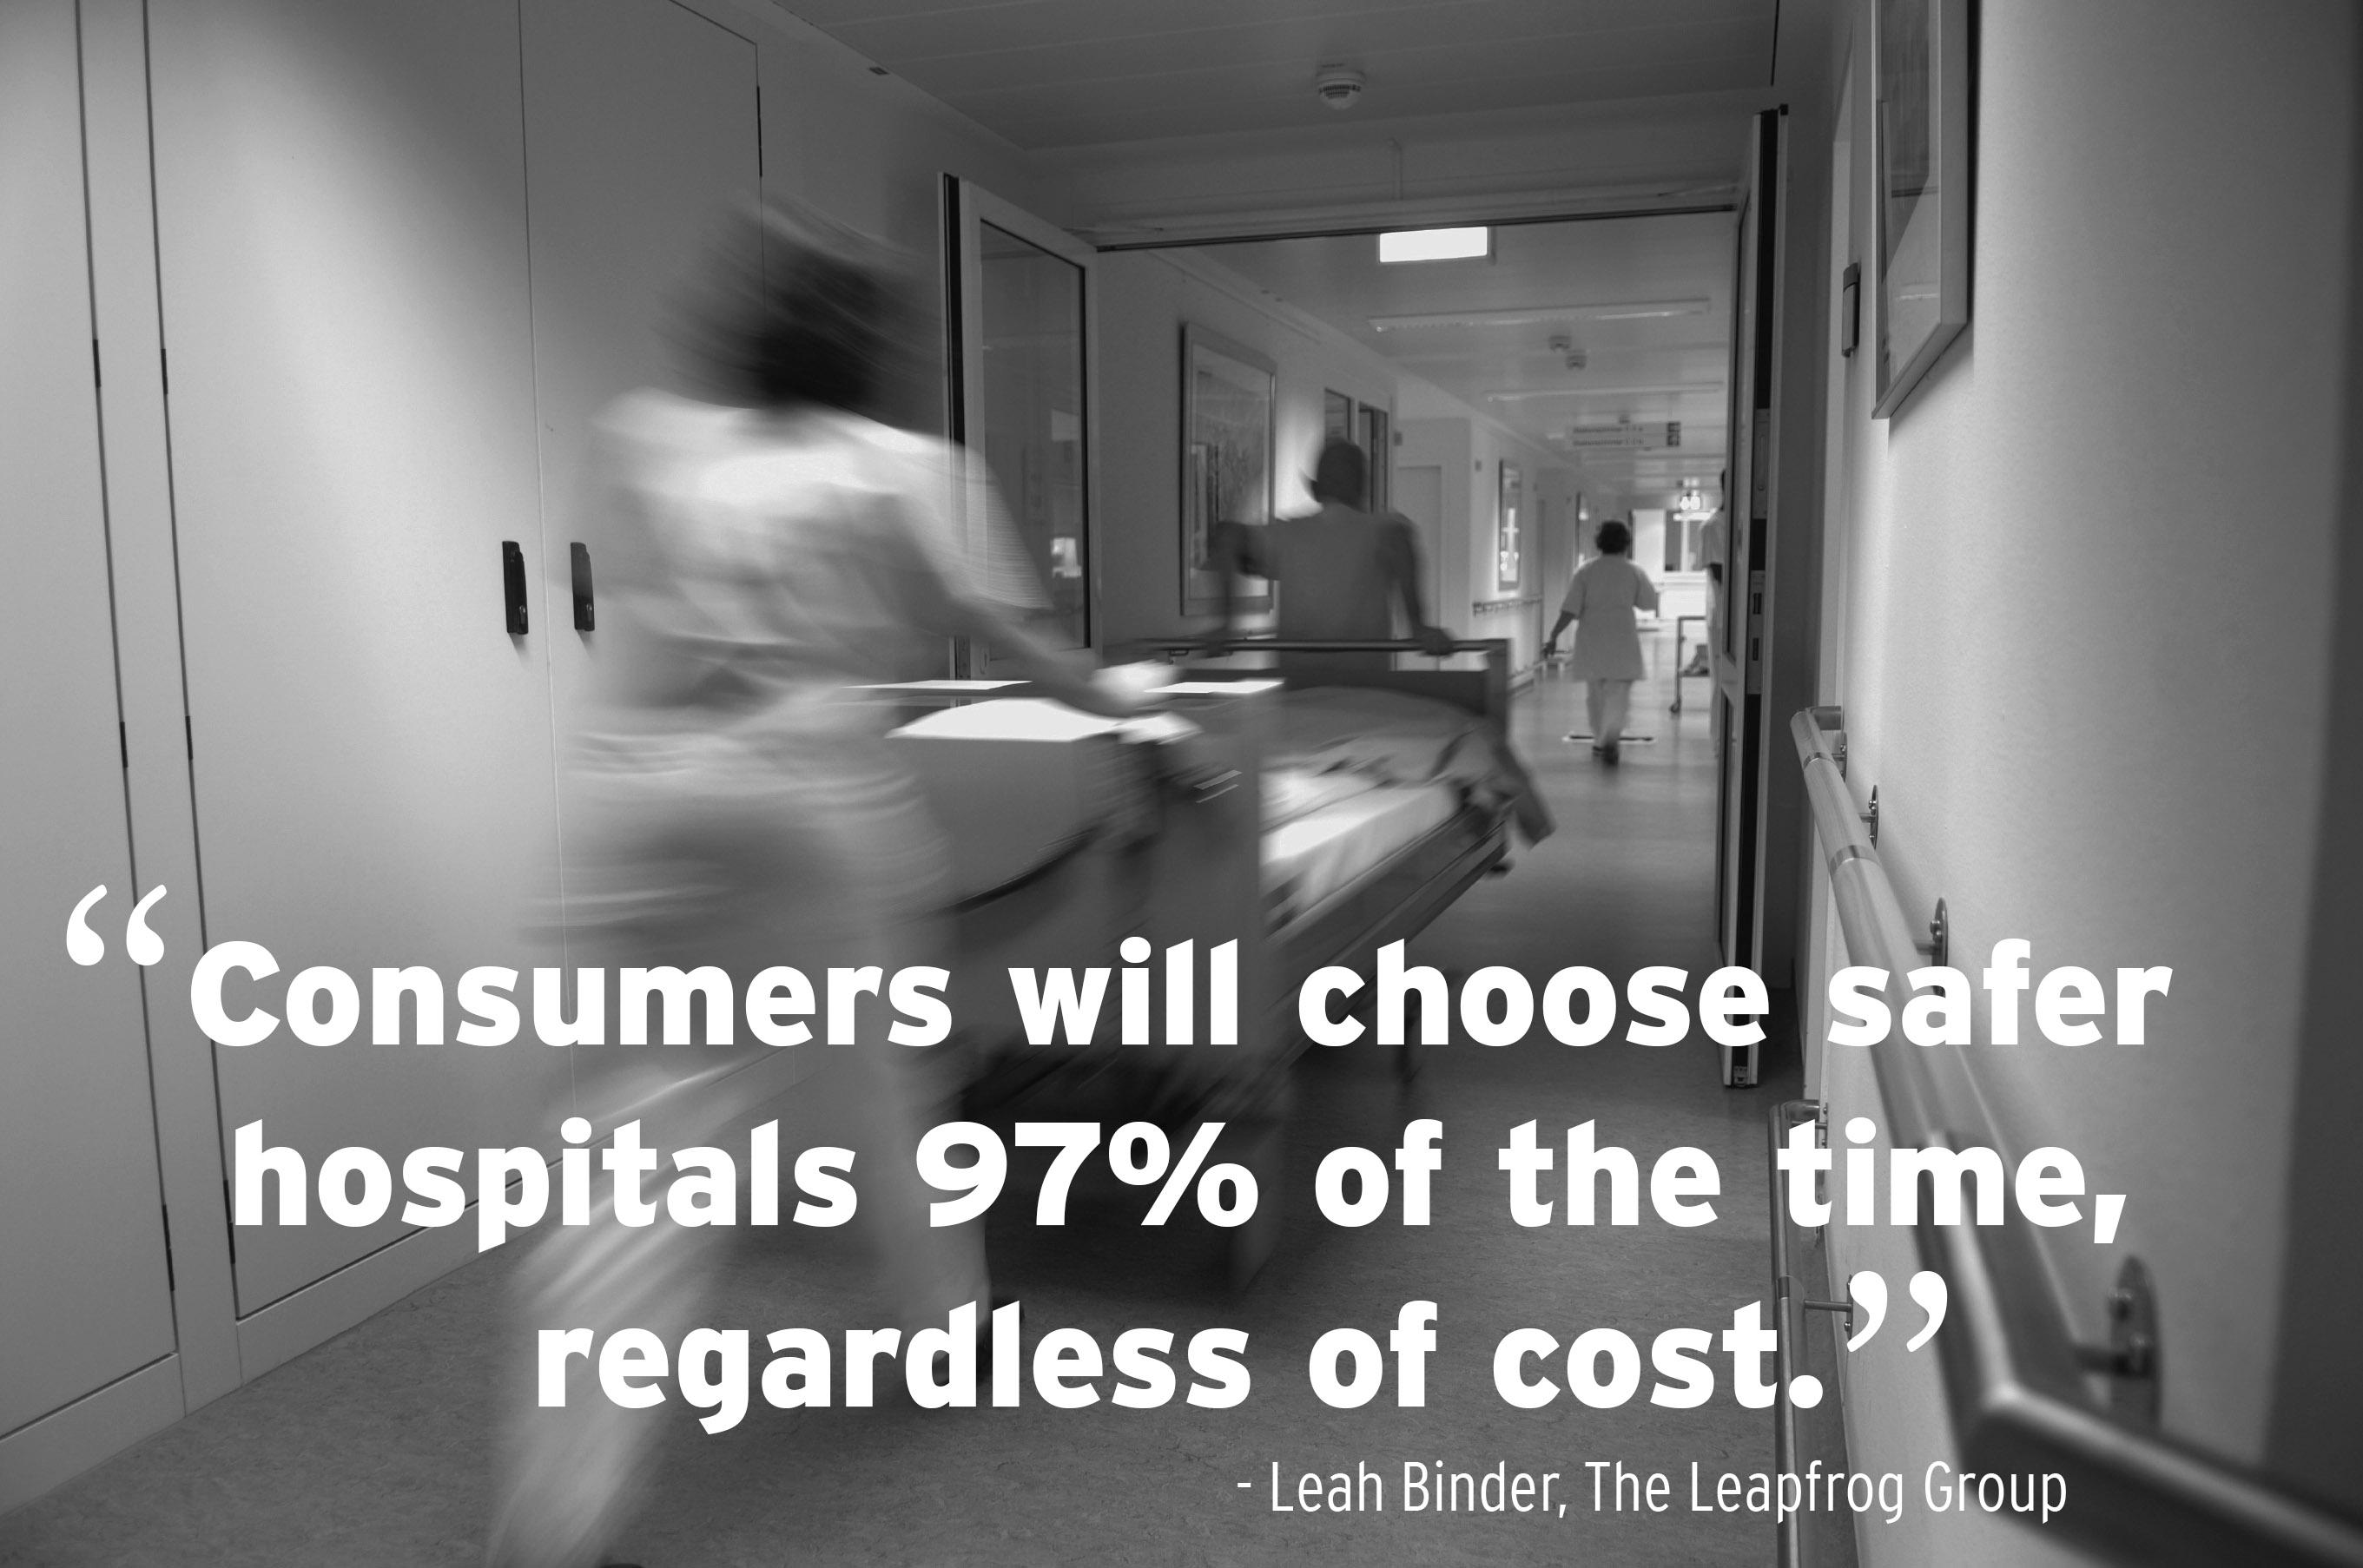 hospital quote